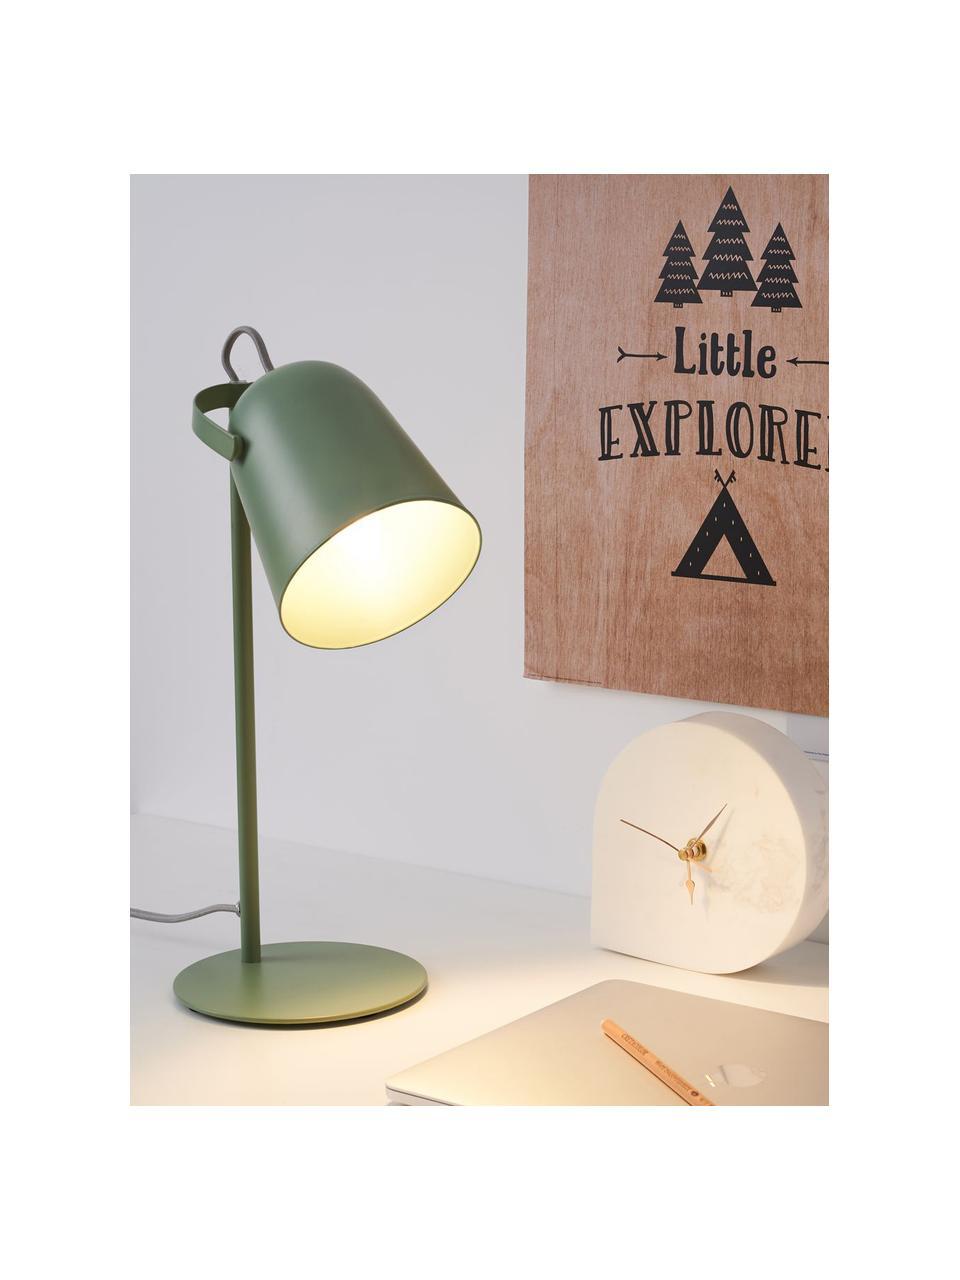 Retro-Schreibtischlampe True Pistachio, Lampenschirm: Metall, beschichtet, Lampenfuß: Metall, beschichtet, Grün, Ø 15 x H 40 cm